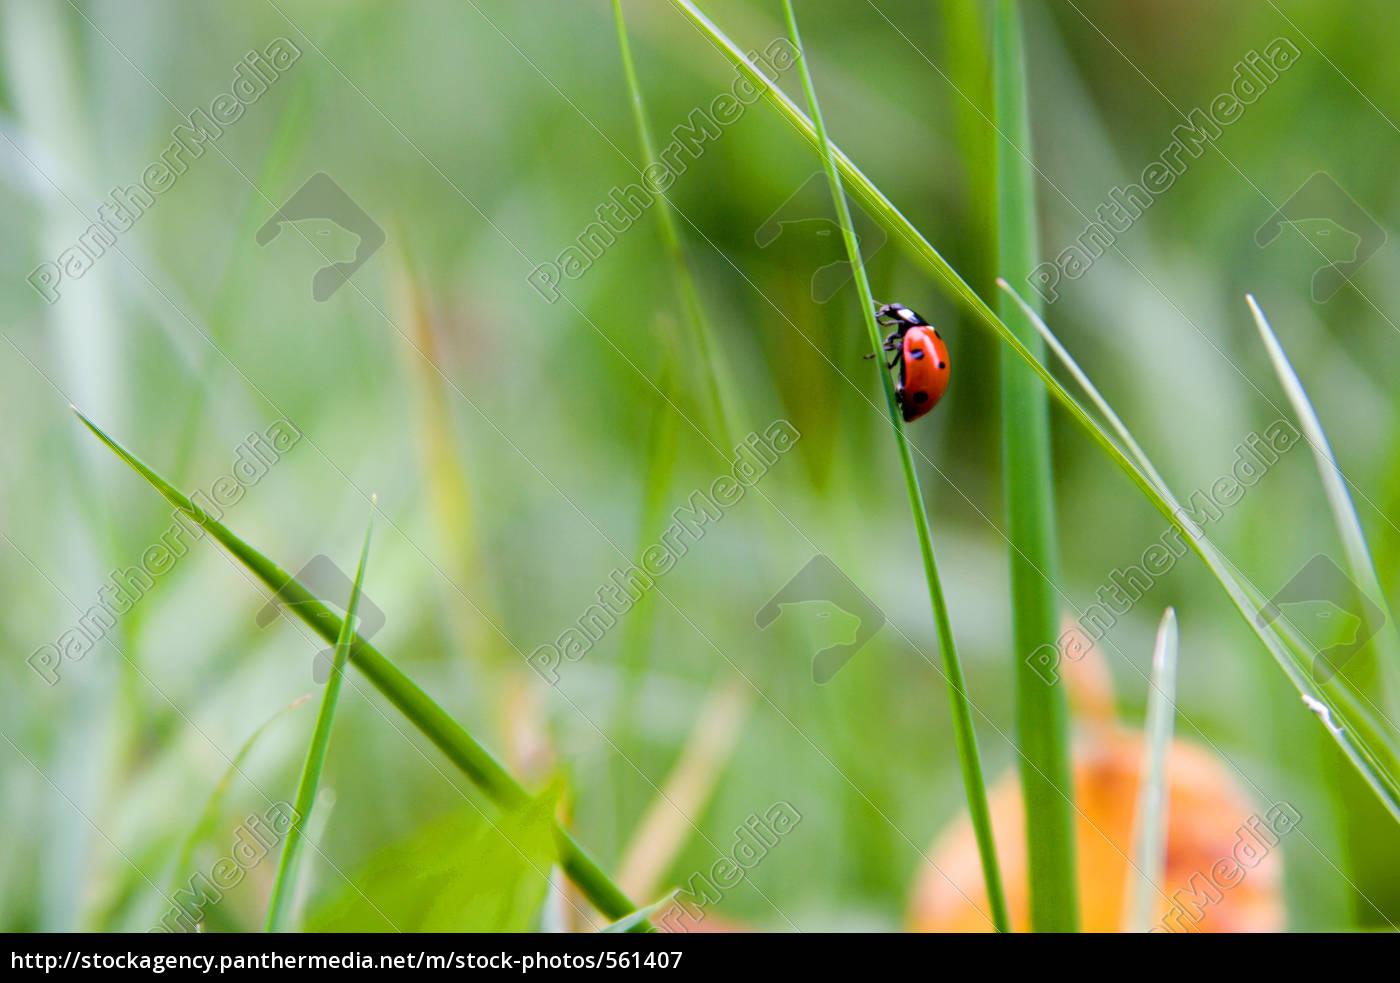 a, ladybug, on, the, way, up - 561407